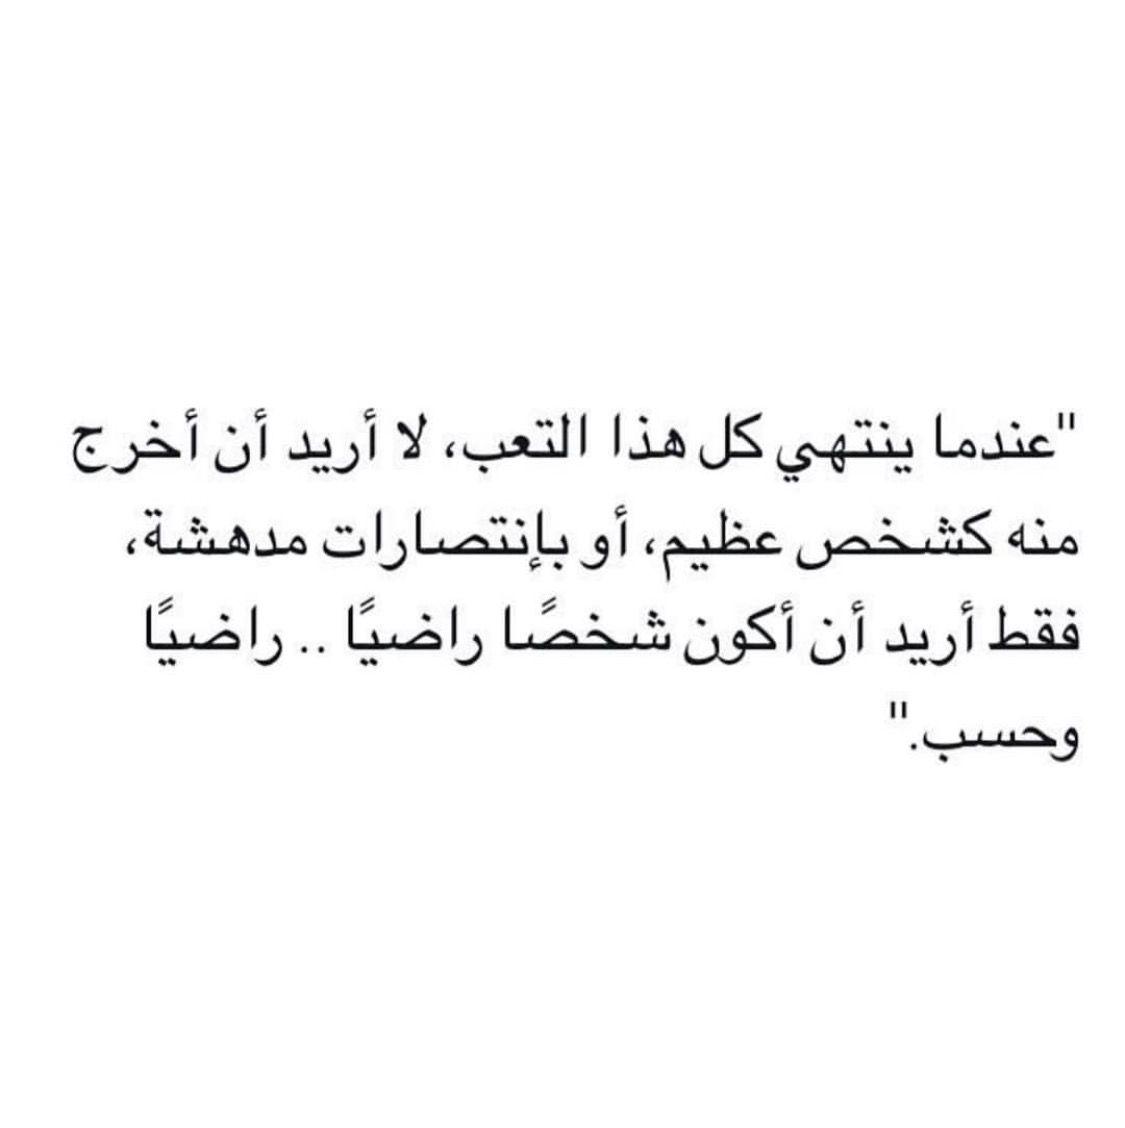 Pin by stephanie on اقتباسات | Arabic love quotes, Arabic